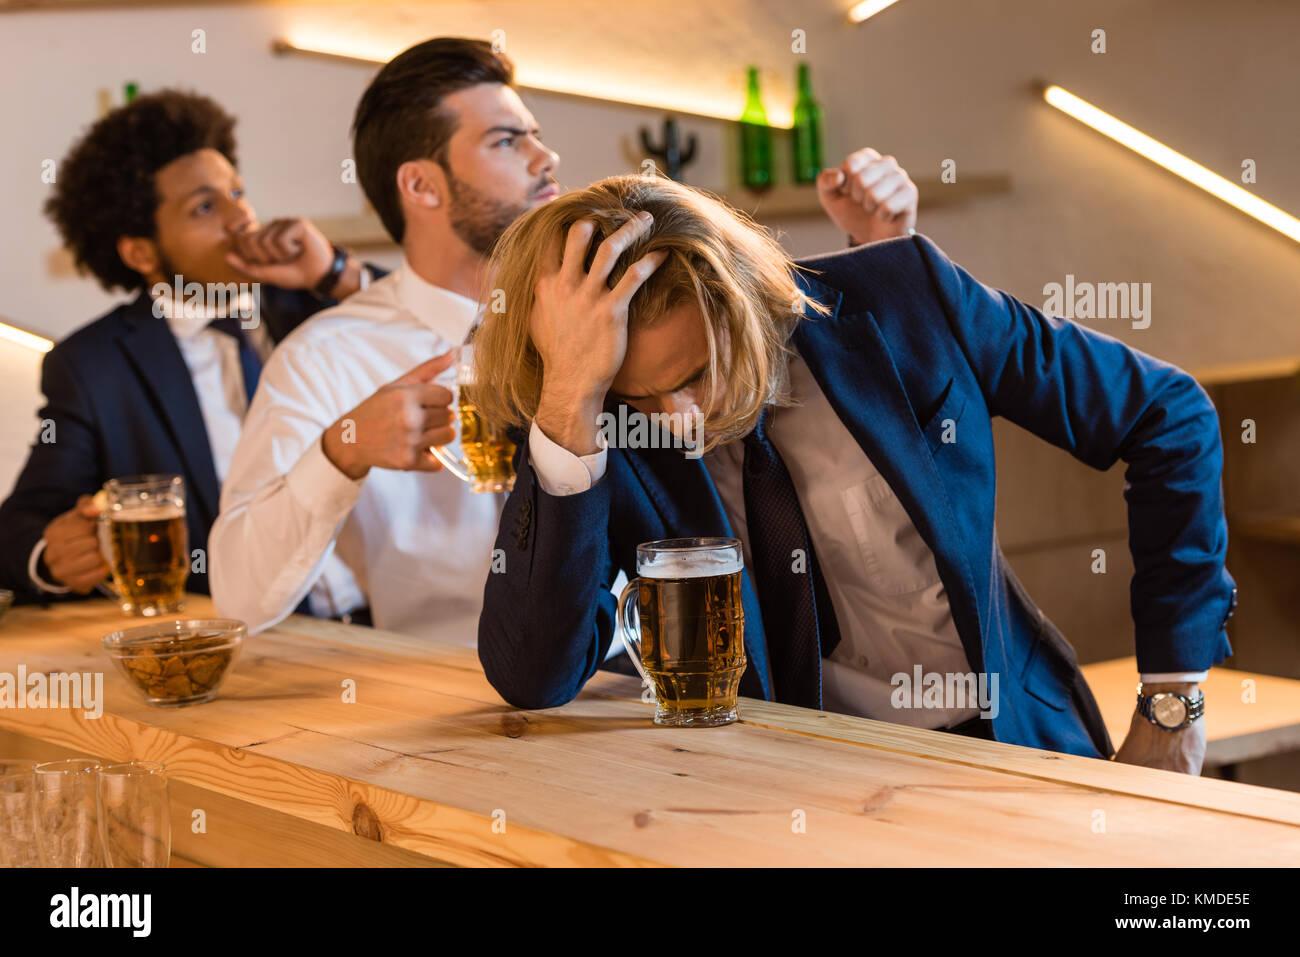 businessmen drinking beer in bar - Stock Image